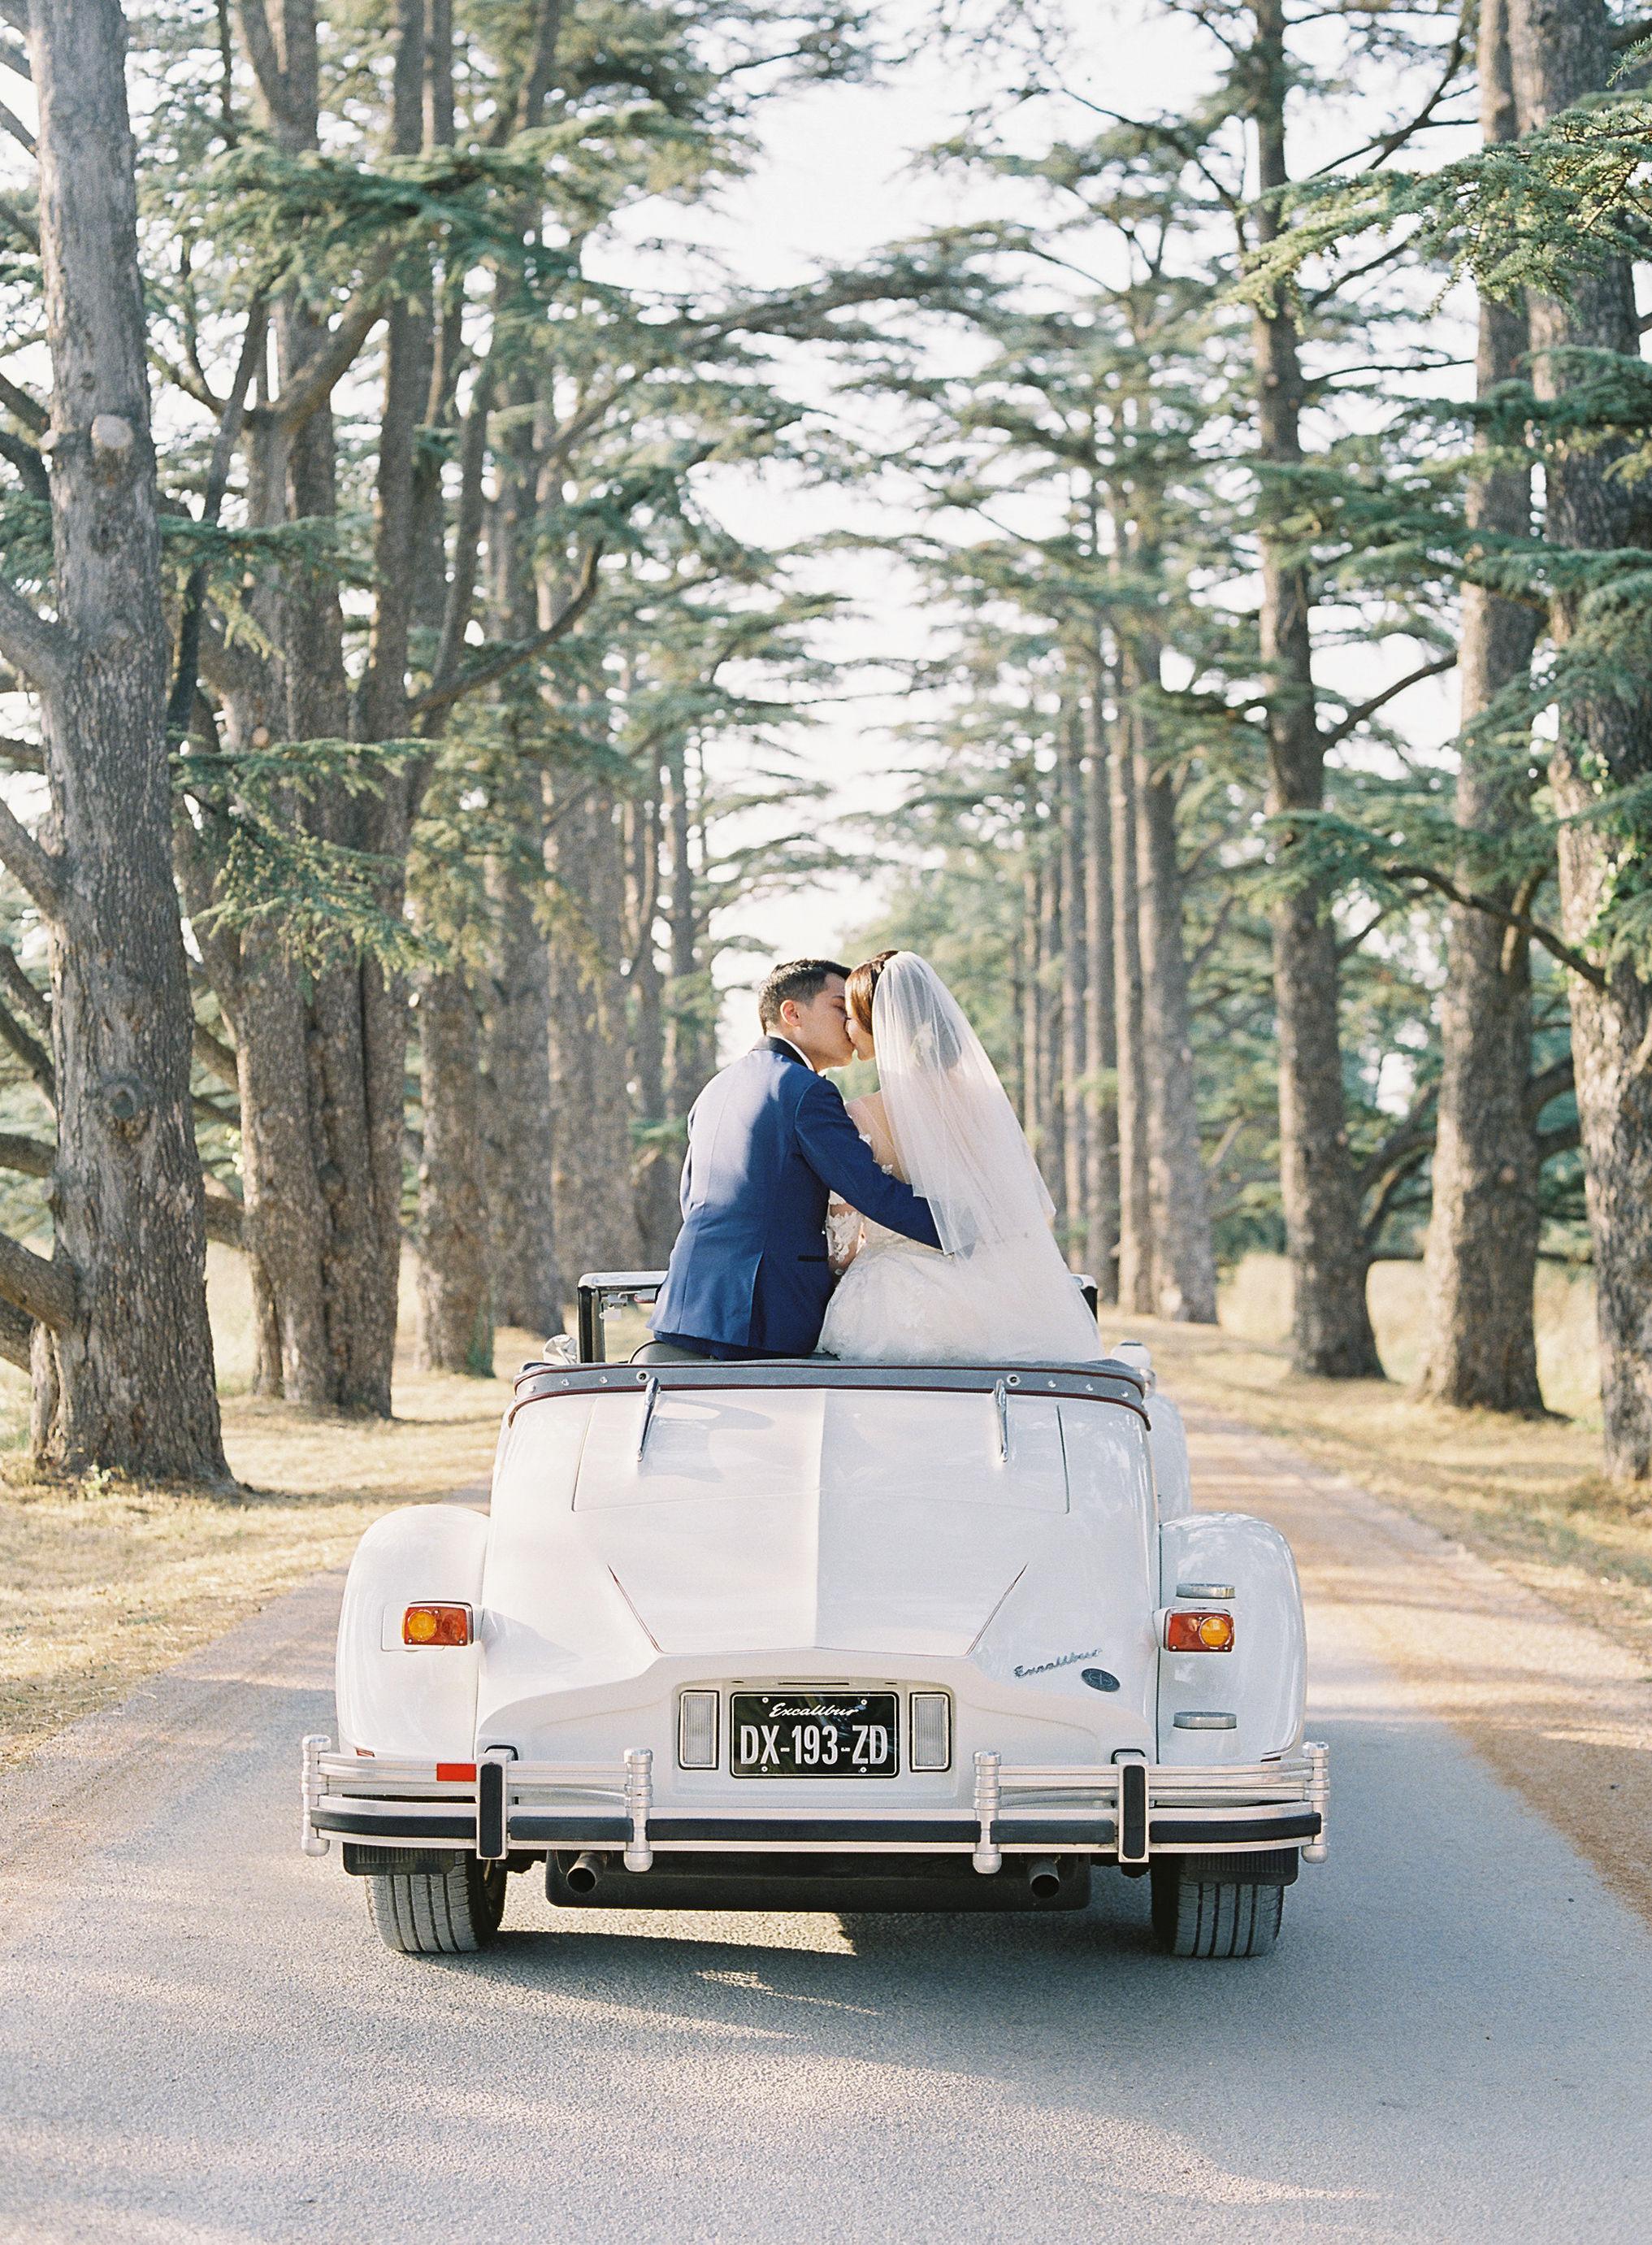 janet patrick wedding couple in vintage car